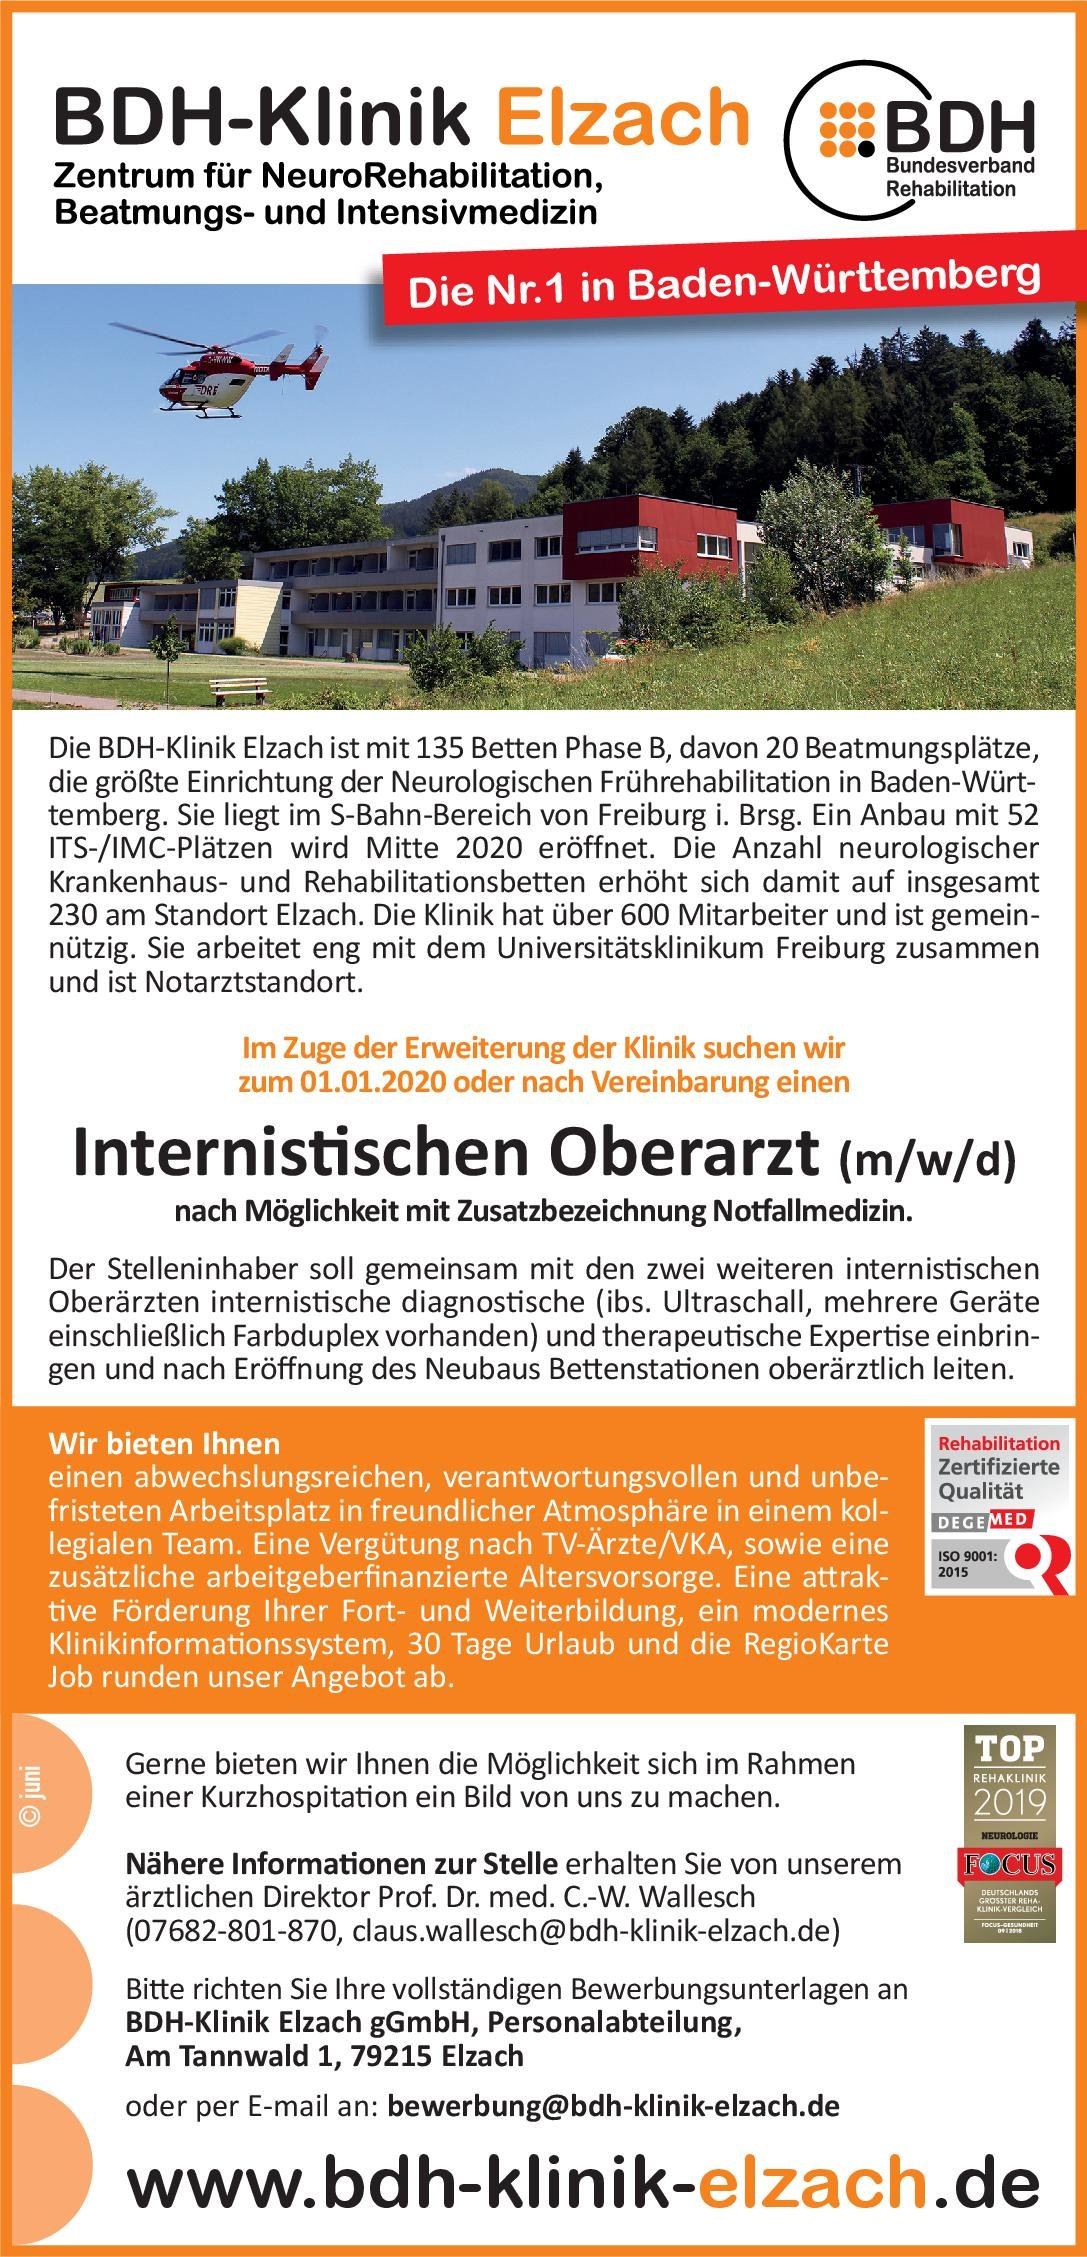 BDH-Klinik Elzach Internistischer Oberarzt (m/w/d)  Innere Medizin, Innere Medizin, Notfallmedizin Oberarzt